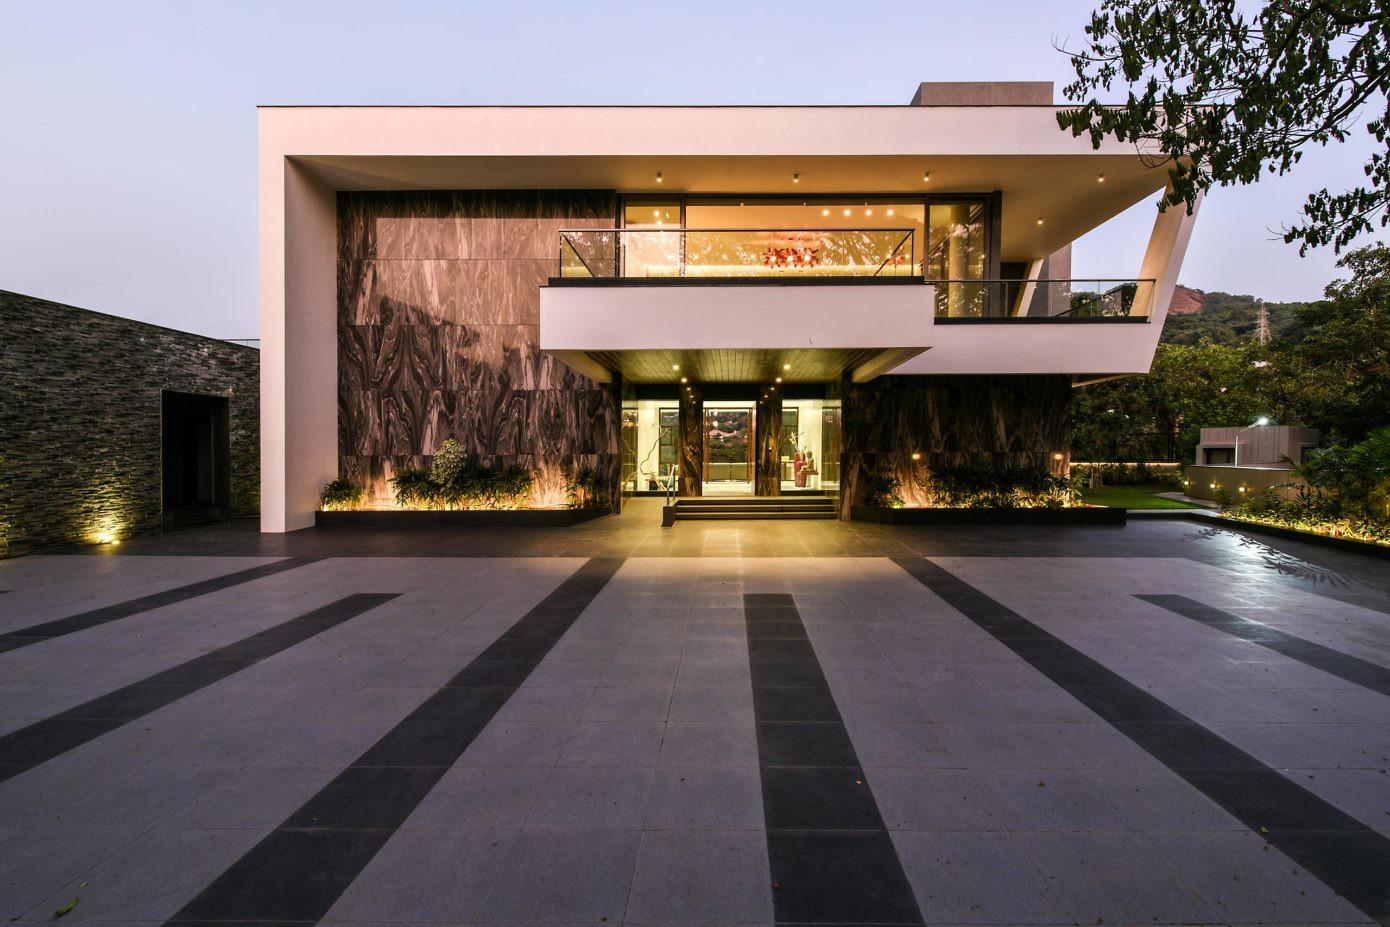 Infinity house by ga design homeadore for Shea homes design studio arizona